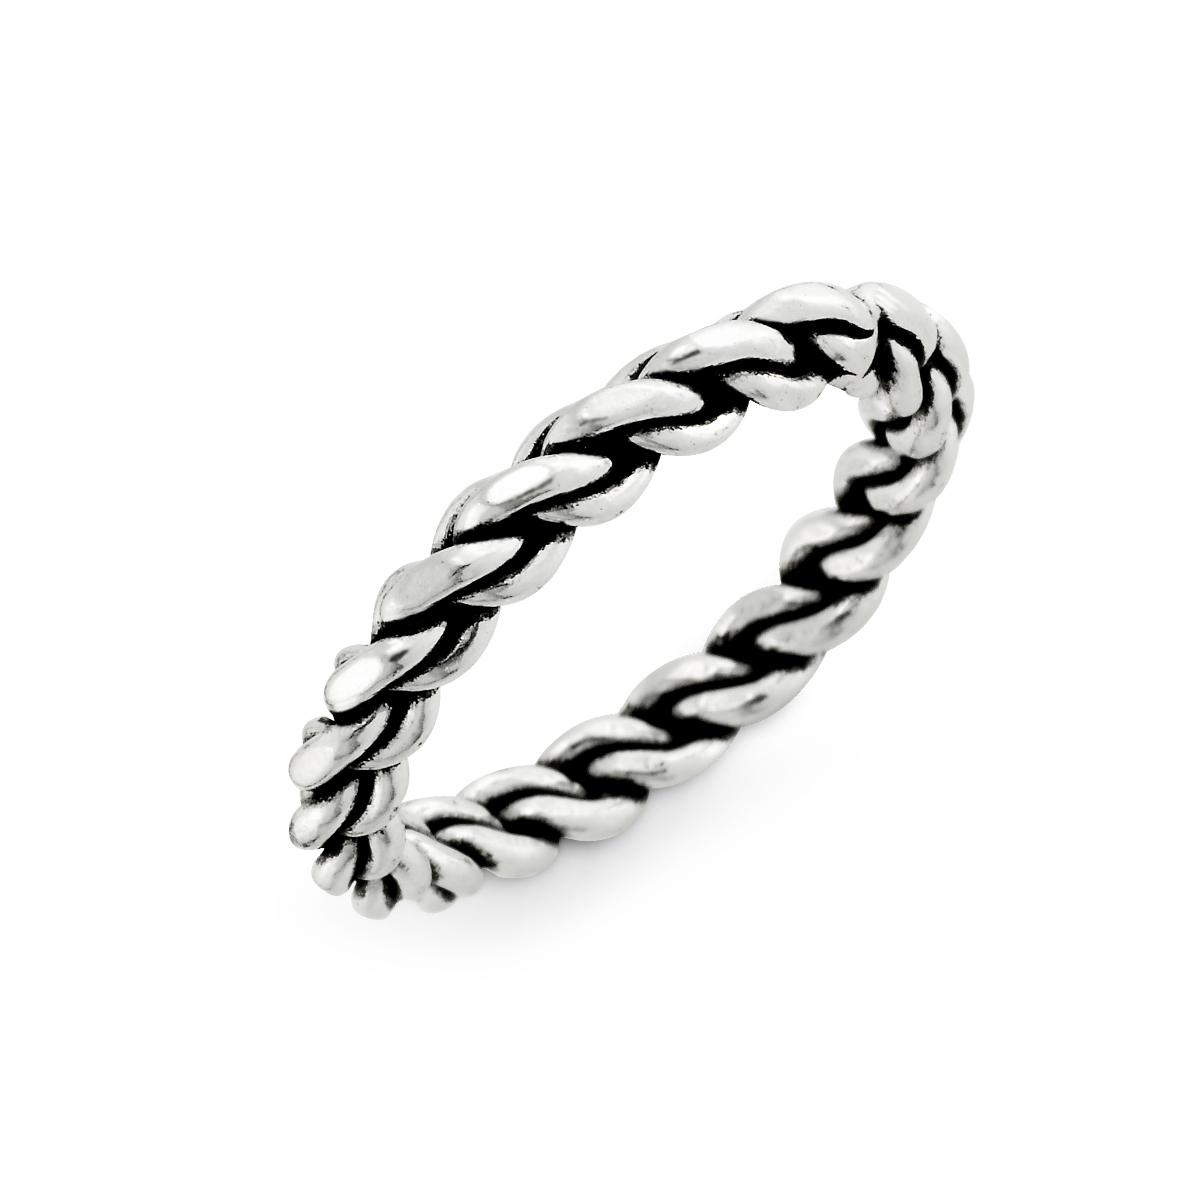 KSW315 經典麻花-姊妹款個性麻花戒指